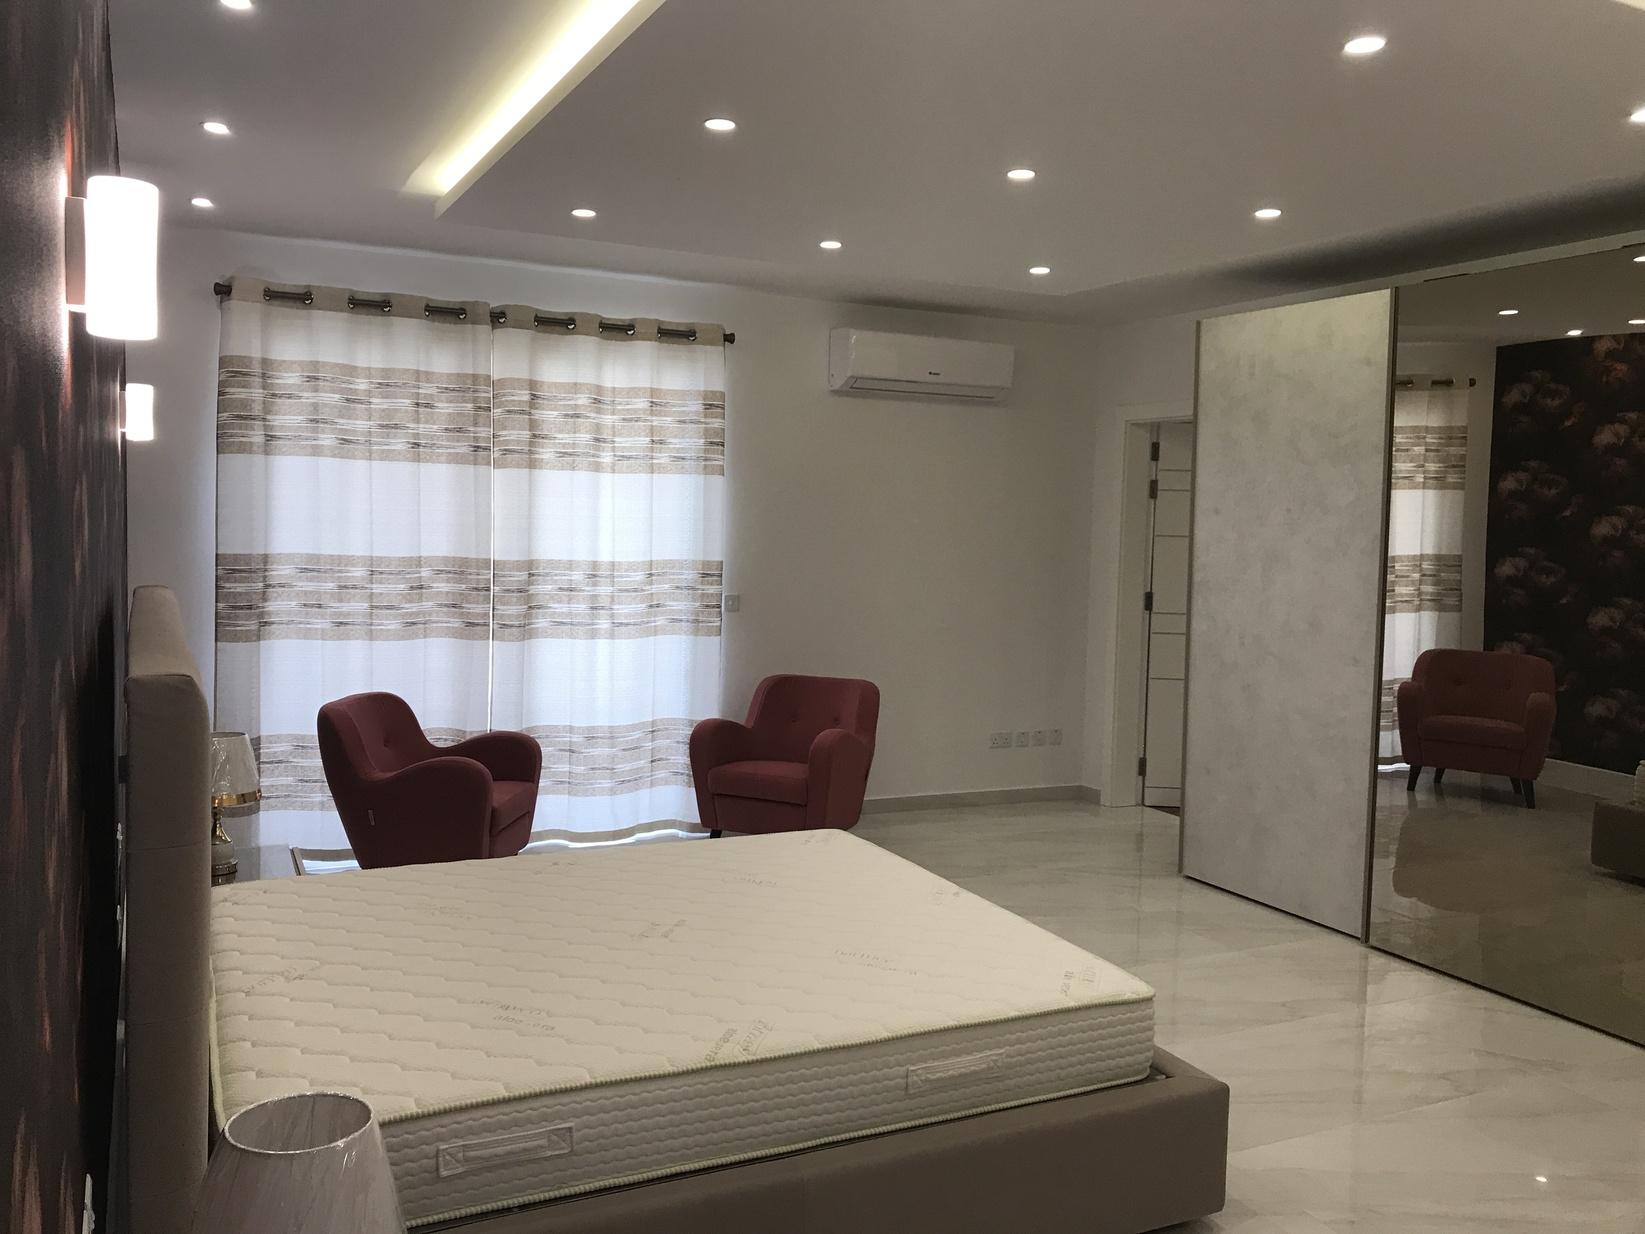 3 bed Apartment For Rent in Qawra, Qawra - thumb 20